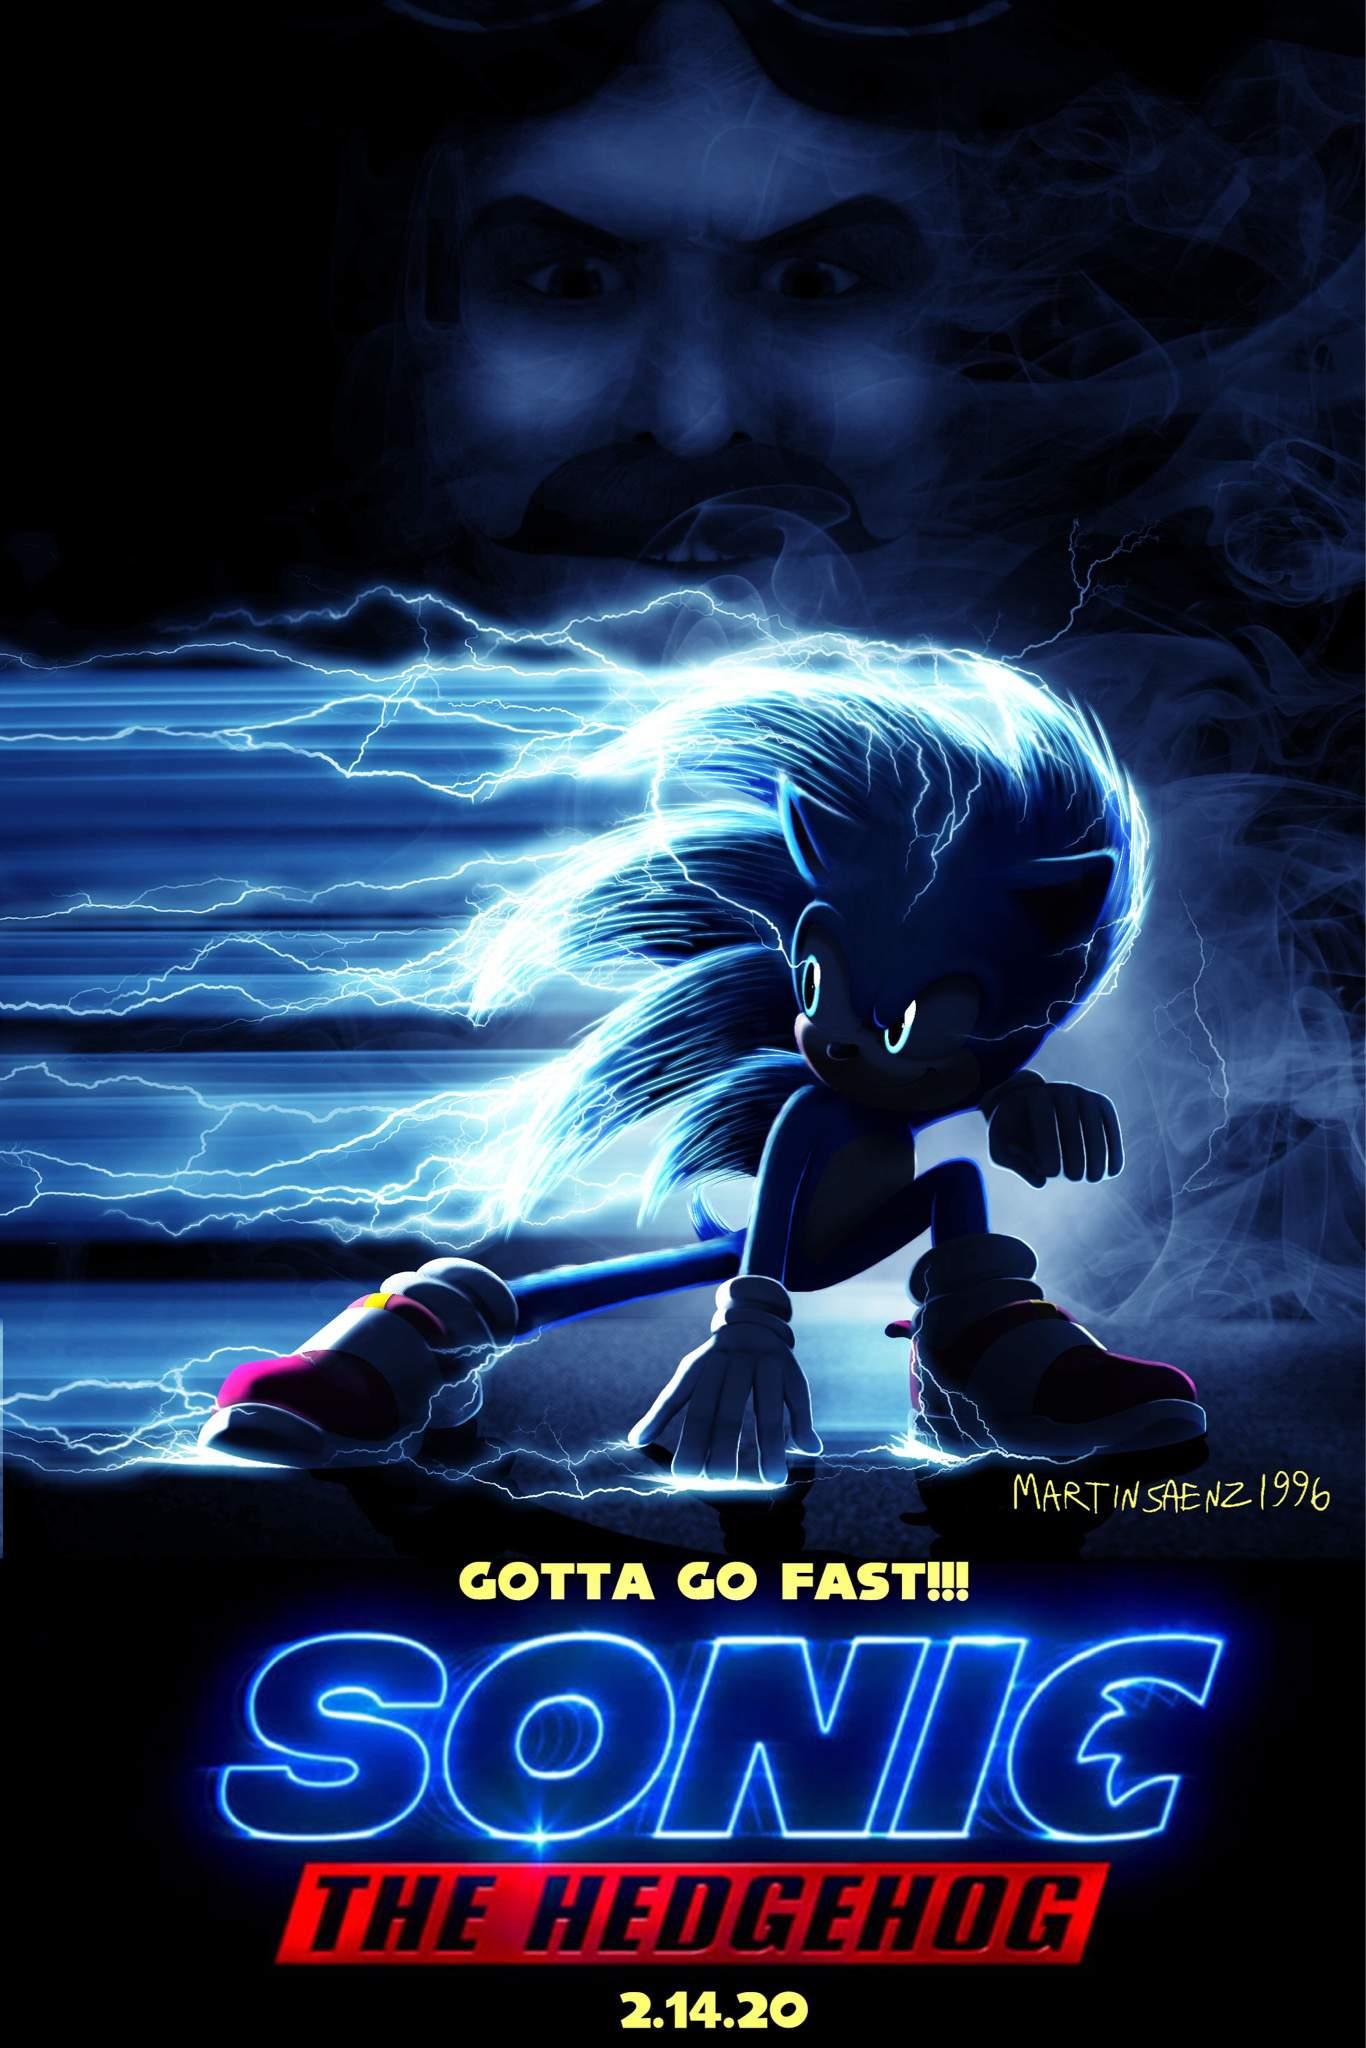 Sonic Movie Poster Mockup Sonic The Hedgehog Amino